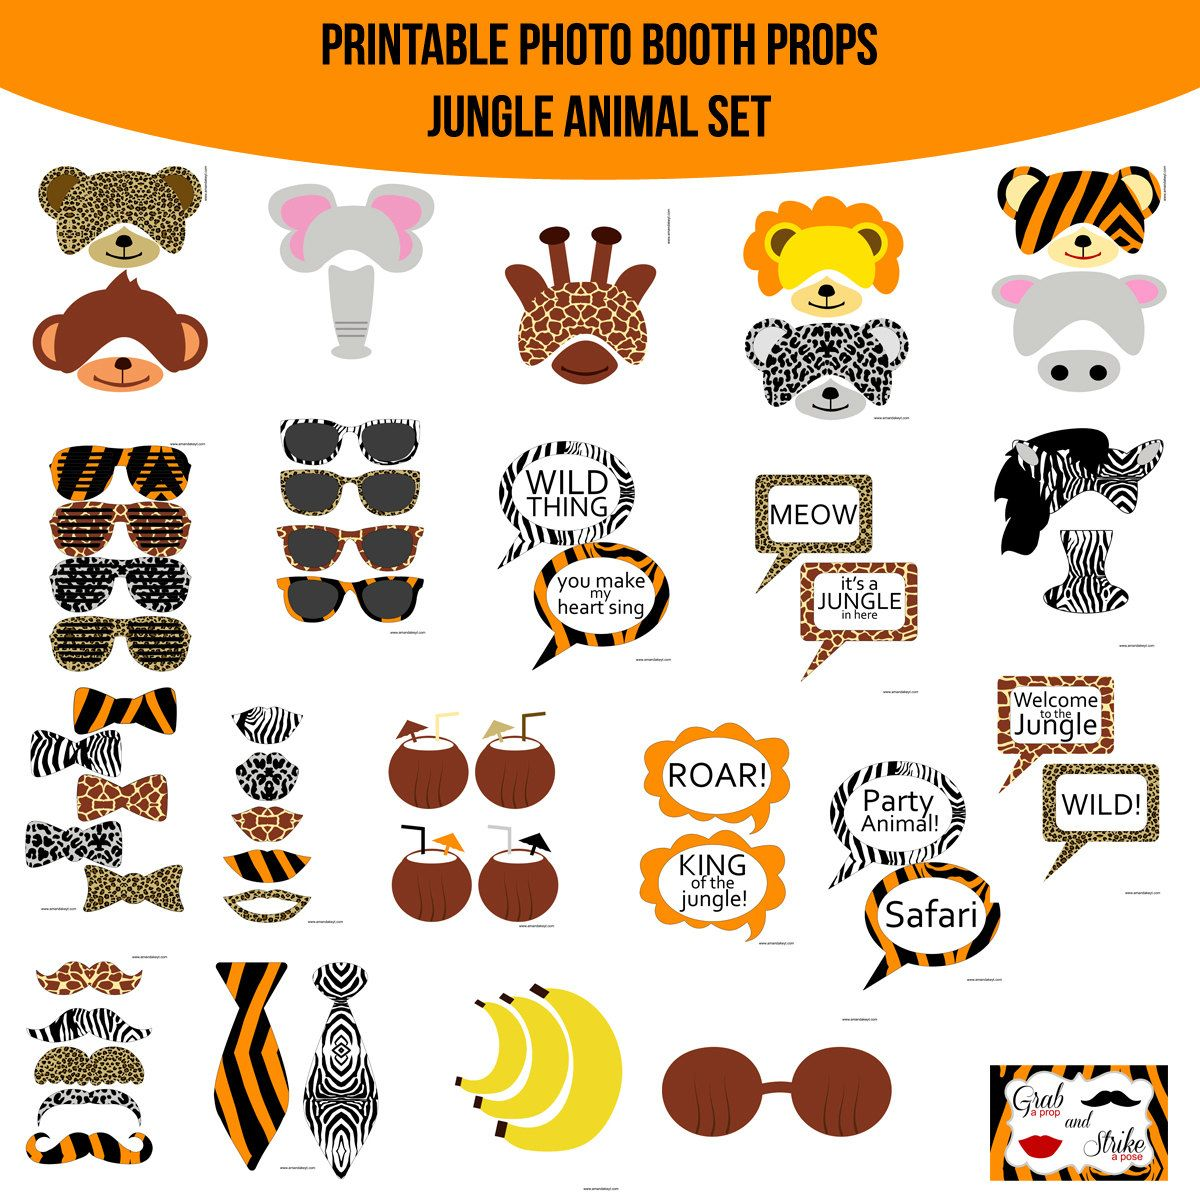 Google themes leopard - Instant Download Jungle Animal Print Safari Zebra Cheetah Tiger Leopard Giraffe Lion Monkey Printable Photo Booth